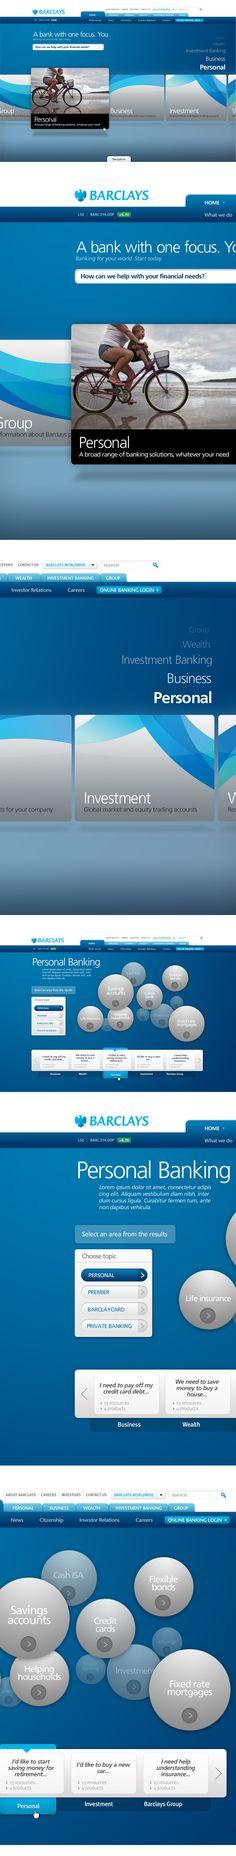 Barclays.com by Thomas Moeller, via #Behance #Webdesign